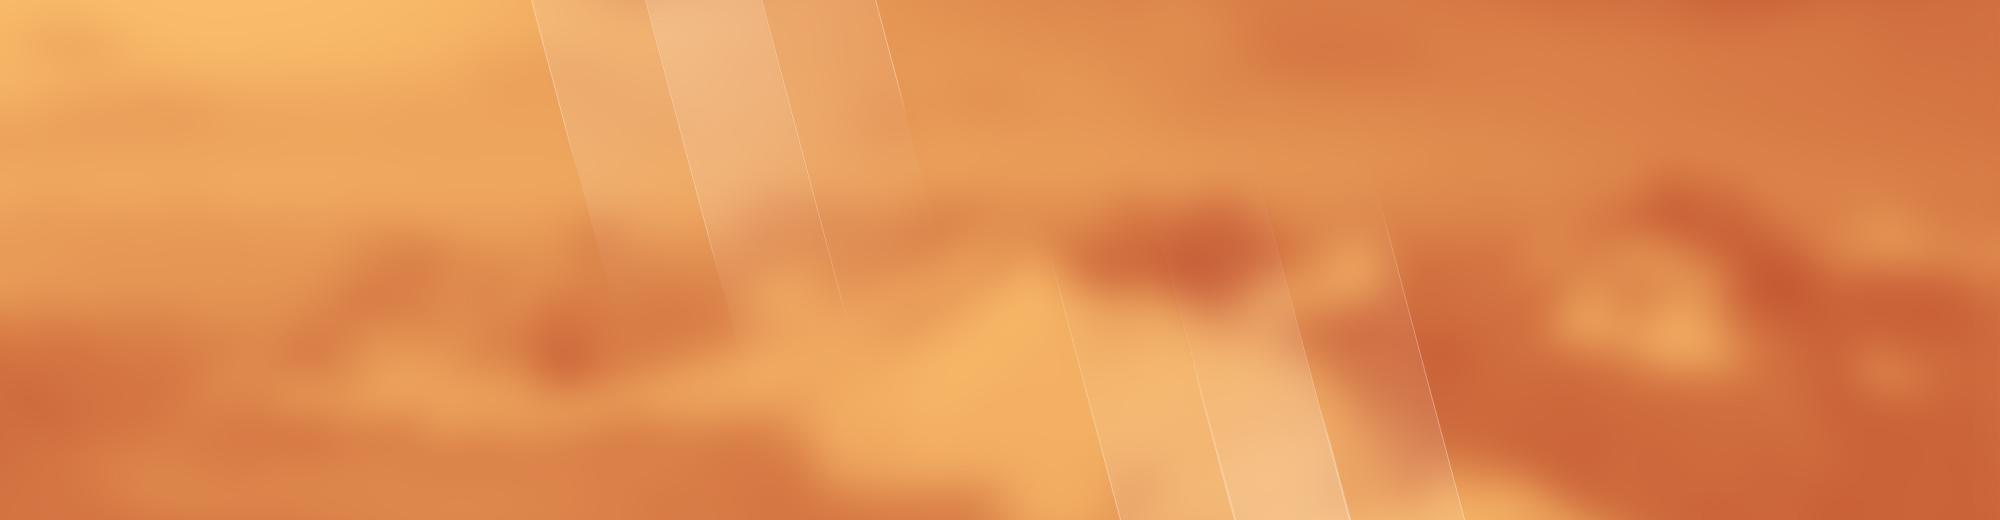 df-4ls-background-Webcore-Nigeria-Website-Design-Nigeria